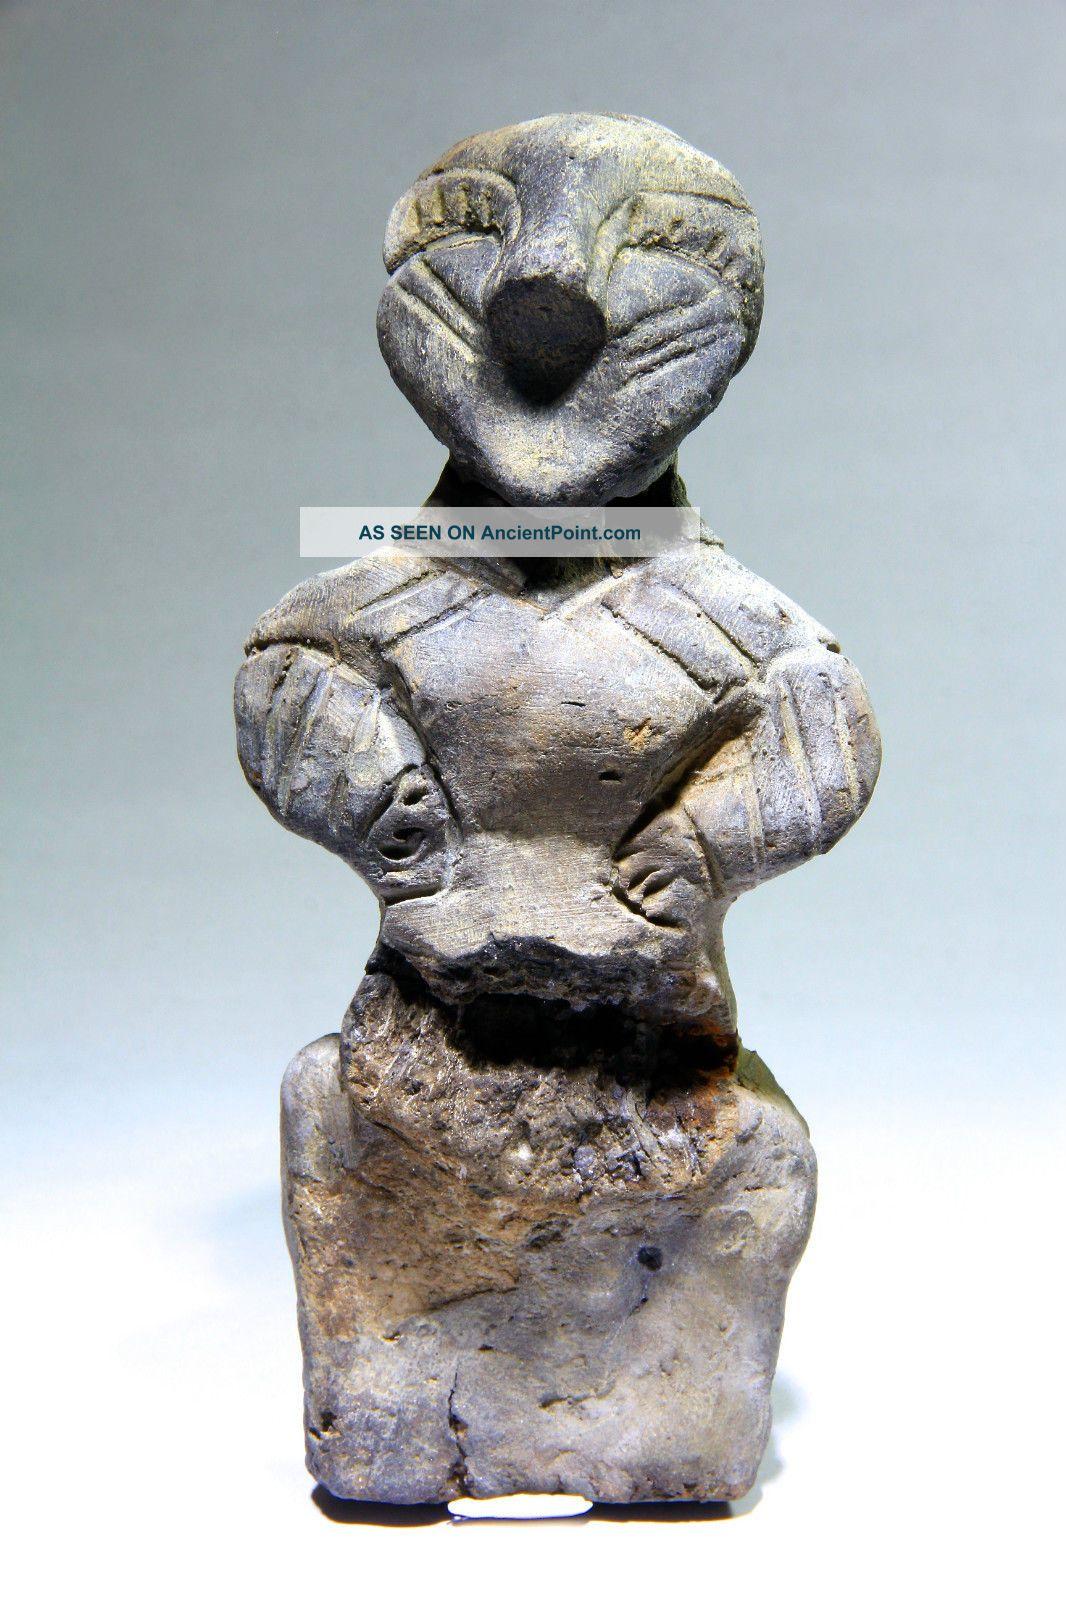 Scarce Ancient Neolithic Stone Age Vinca Culture Large Female Idol 5700 - 4500 Bc European photo